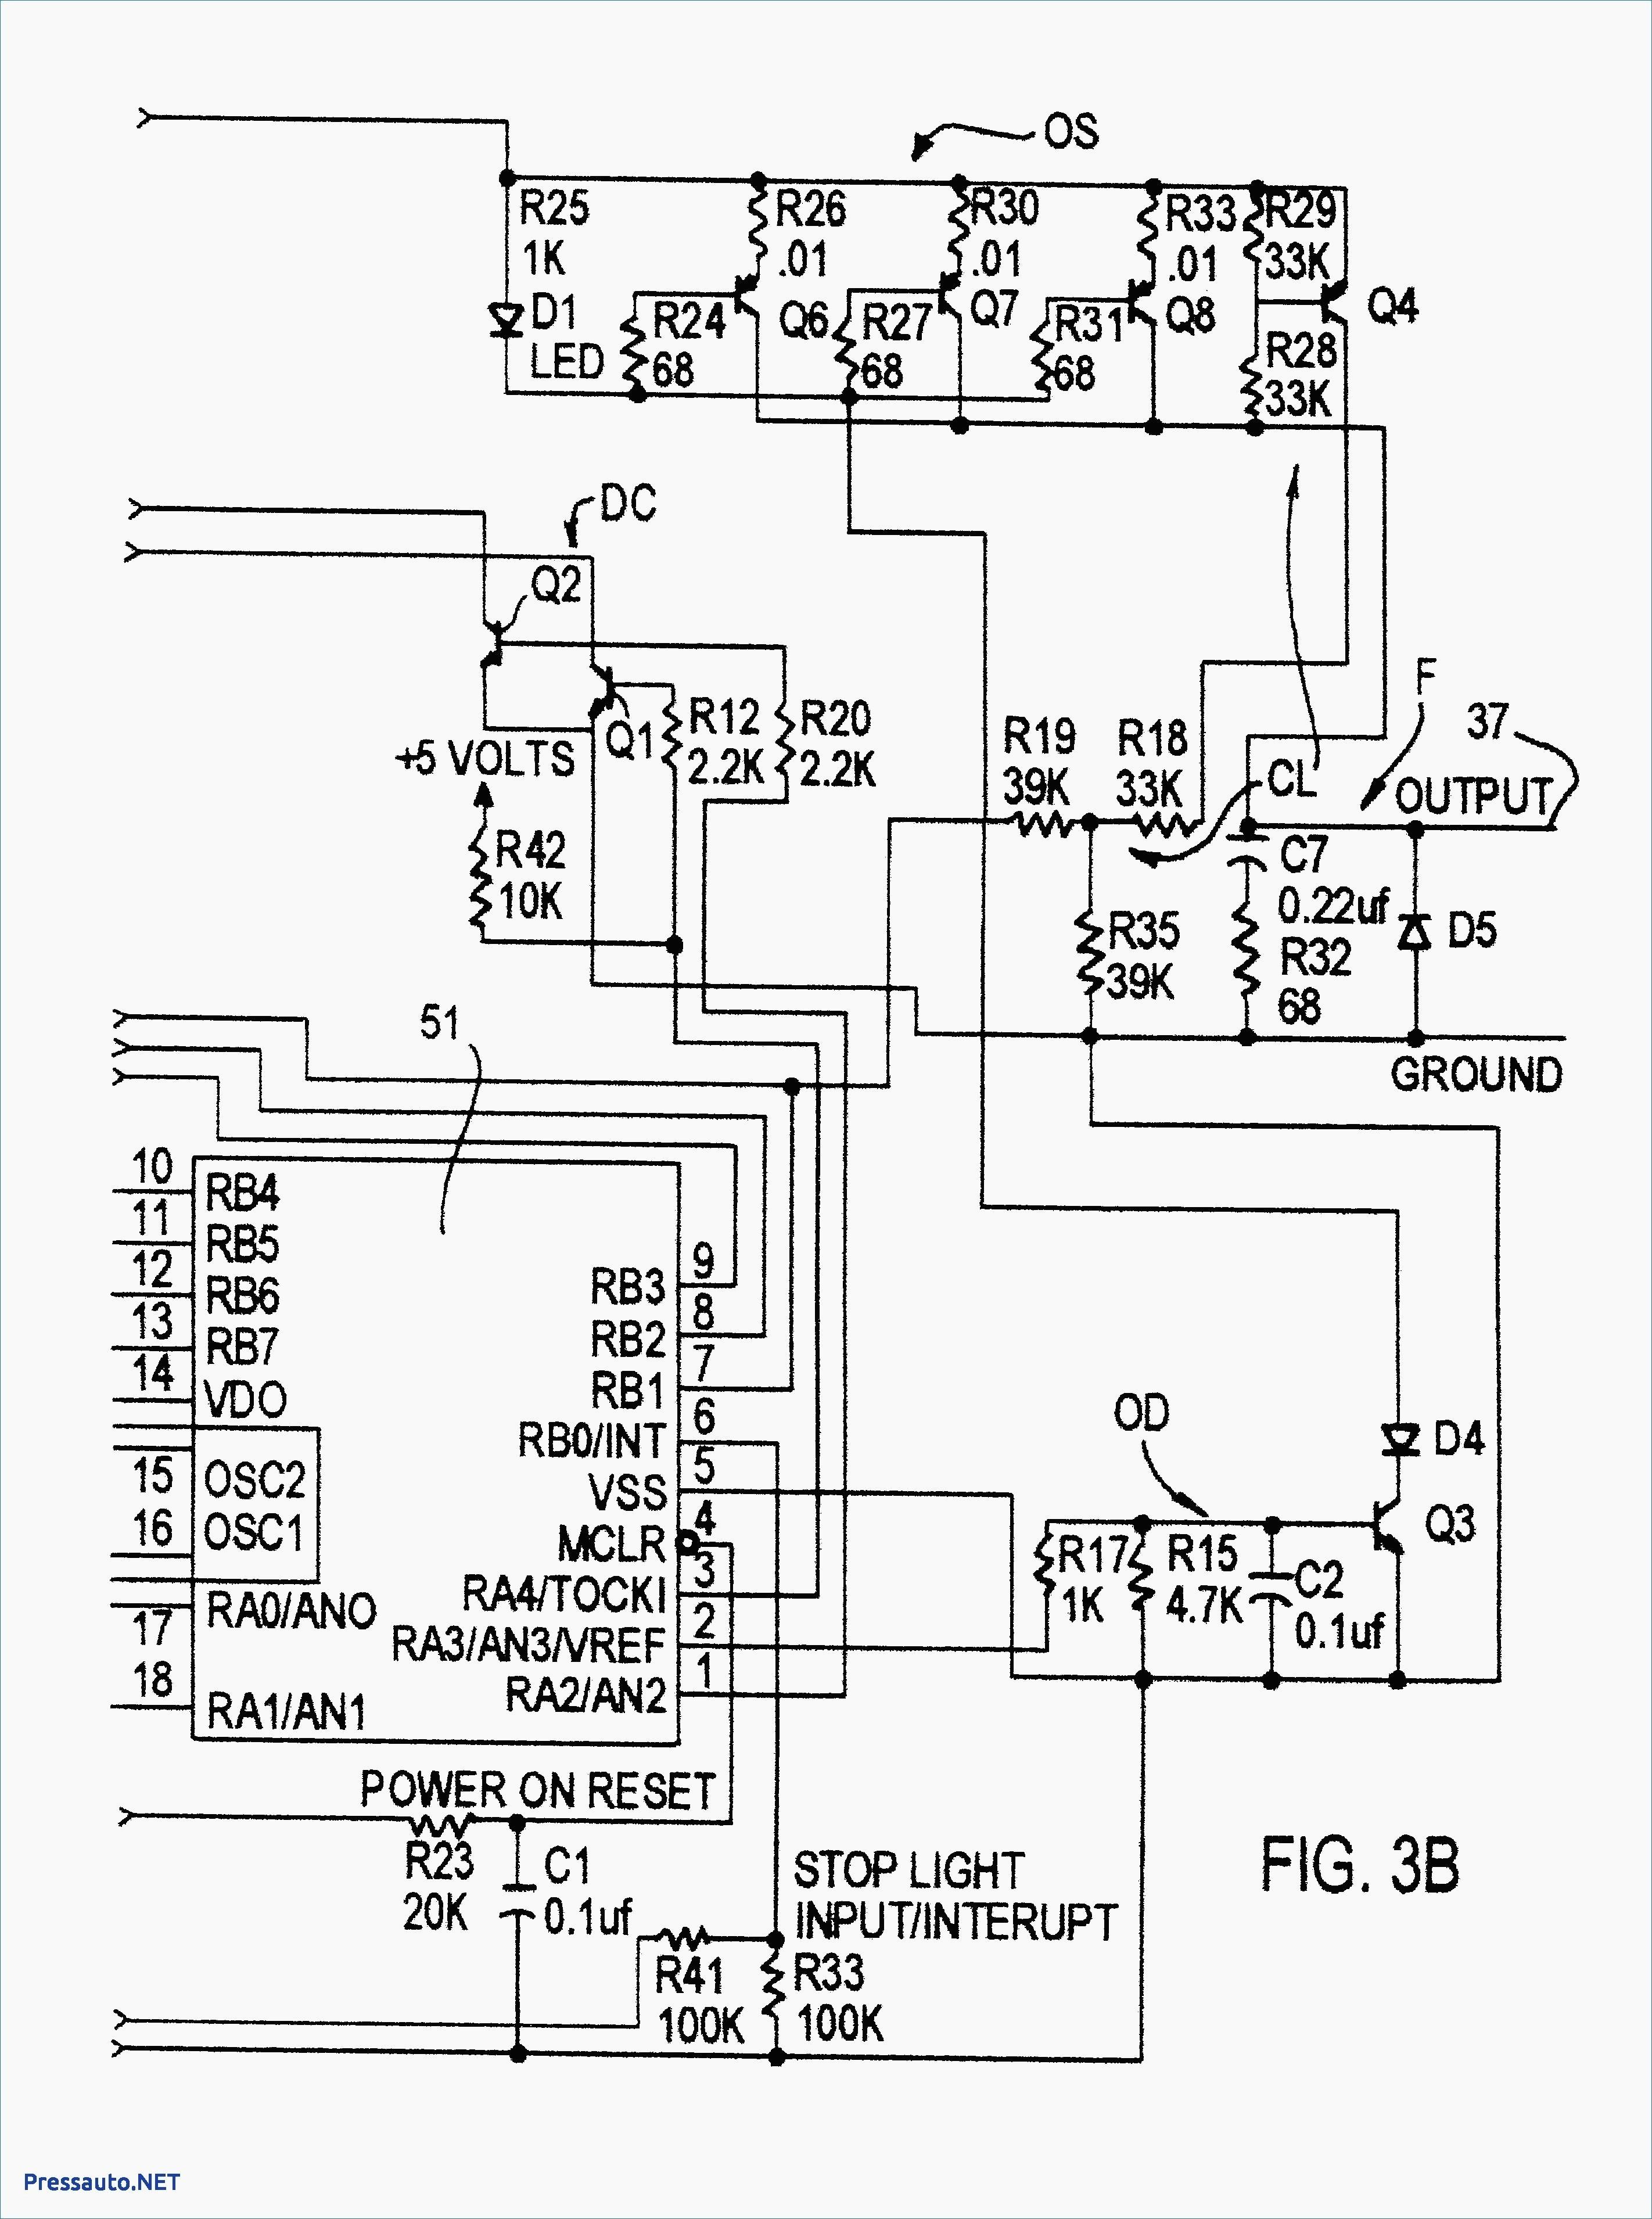 Rv 50 Amp Wiring Diagram Wiring Diagram 50 Amp Plug Best 30 Amp 4 Wire Plug Wiring Diagram Of Rv 50 Amp Wiring Diagram